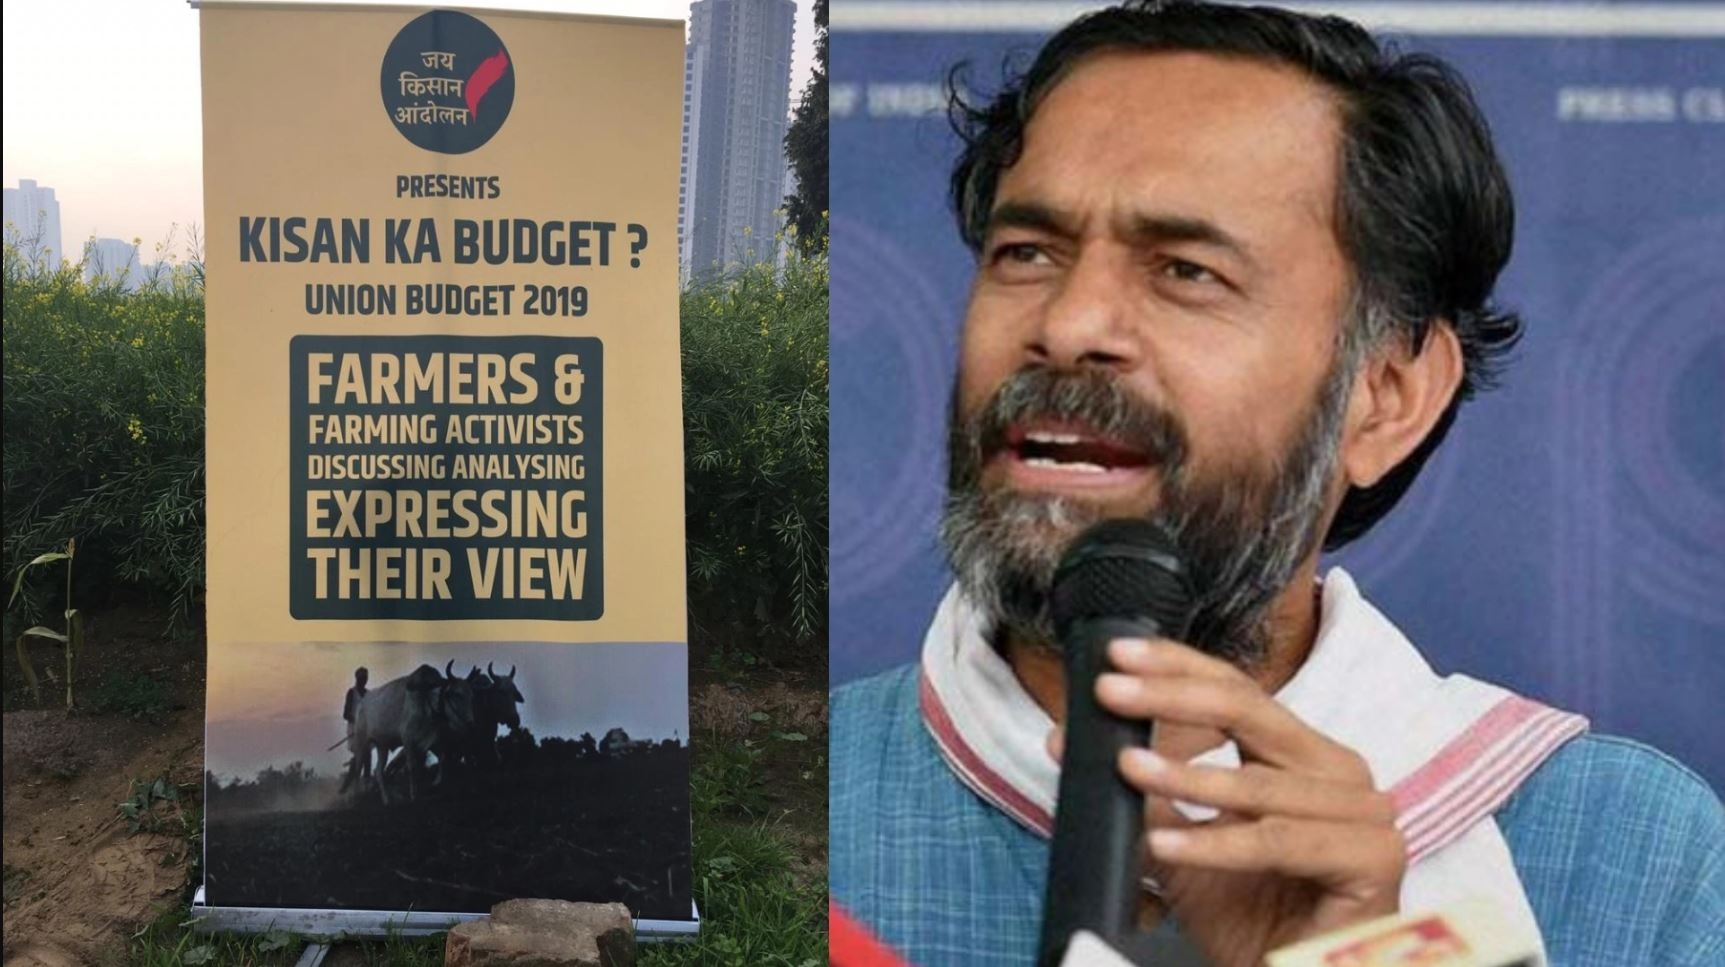 'Budget 2019 Rubs Salt in Farmers' Wounds': Yogendra Yadav